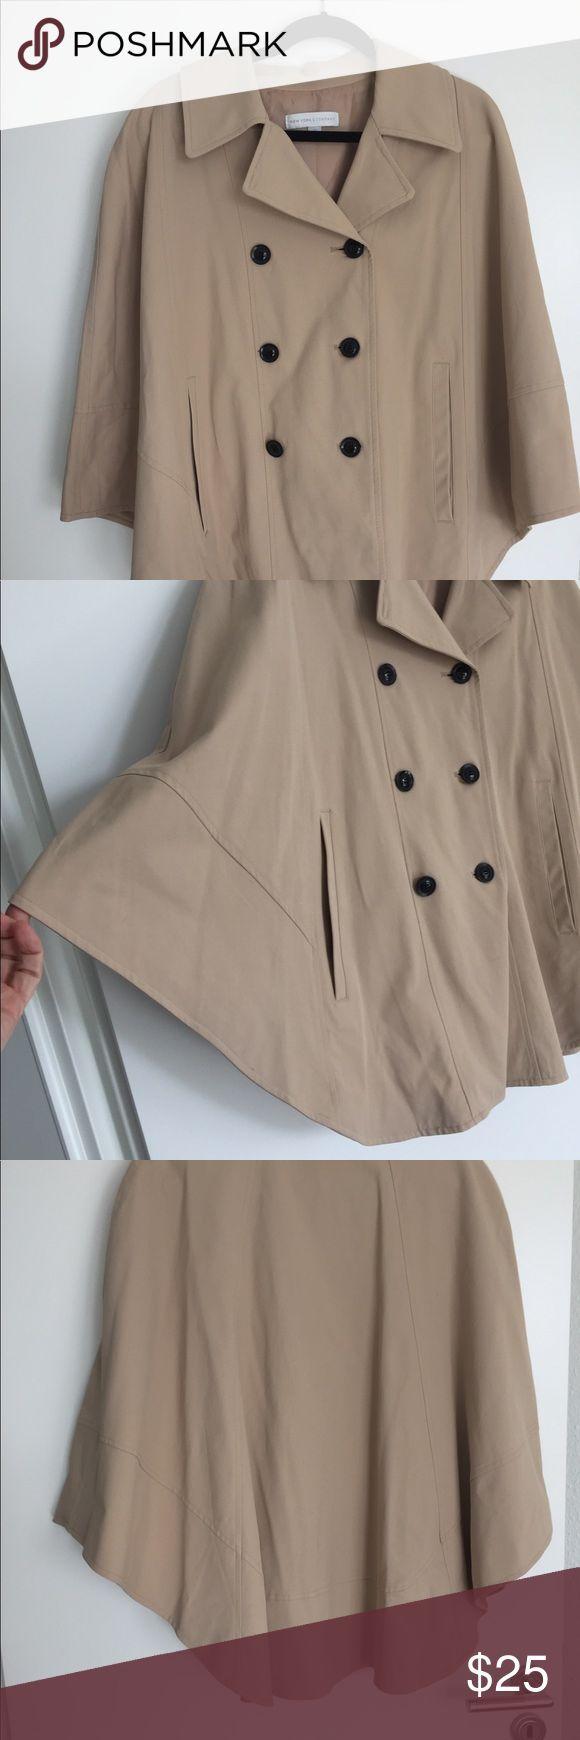 #Cape #Company #Day #Medium #Rain #Rainy #Rainy Day Outfit new york #size #Twirl #York Rain cape Size medium New York and Company rain cape.  Twirl away the rainy day ...        レインケープサイズミディアムニューヨークとカンパニーのレインケープ。この愛らしいユニークなトッパーで雨の日を振り返ります。カーキ色または黄褐色。ニューヨーク&カンパニージャケット&コートケープ #rainydayoutfitforwork